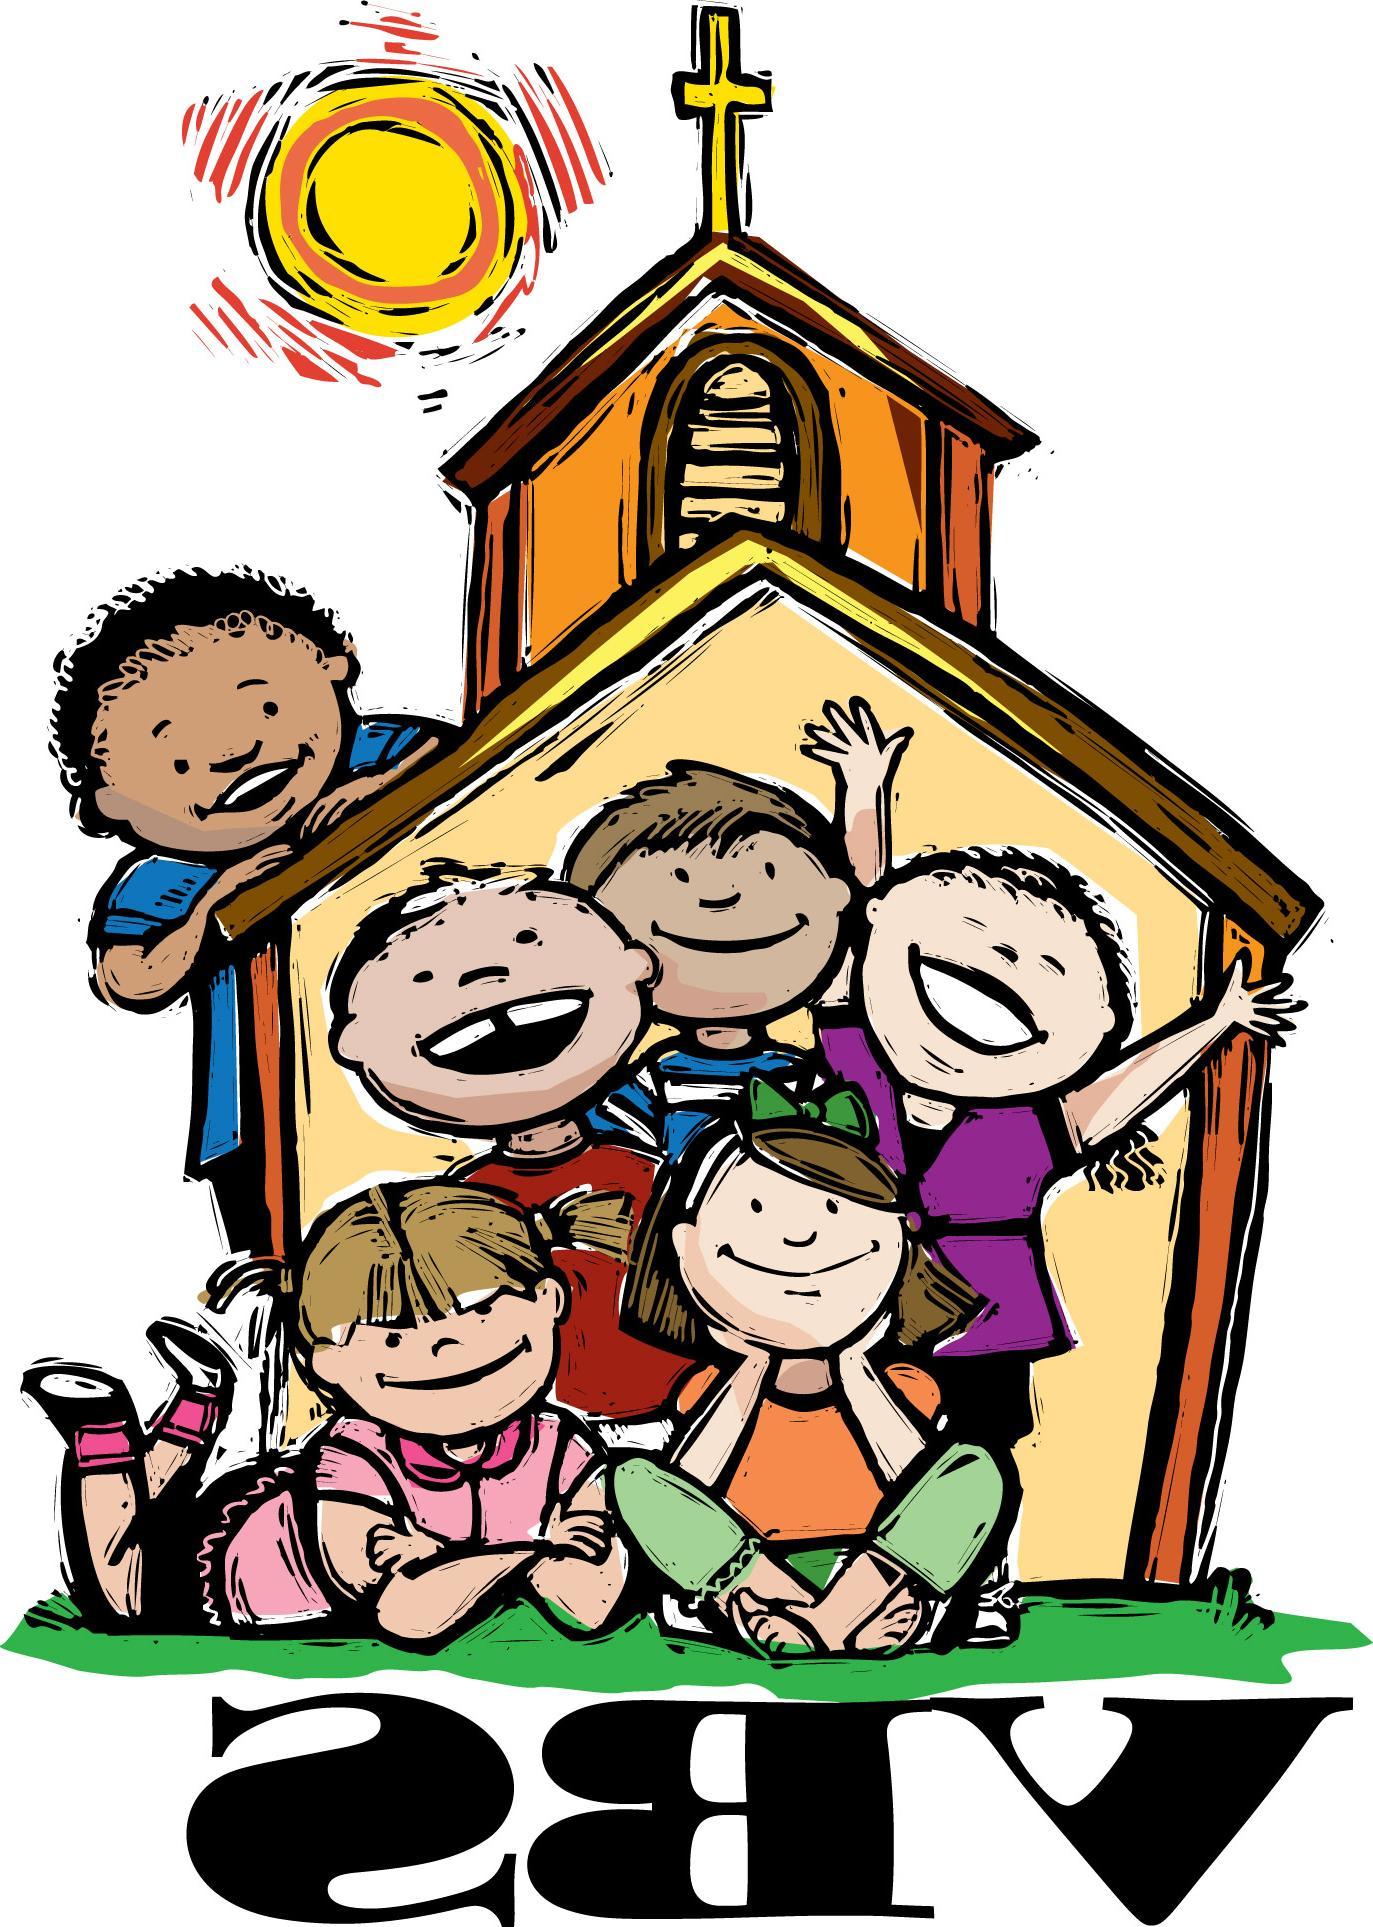 Clipart christiansunite banner freeuse Unique Church Family Clip Art Image » Free Vector Art, Images ... banner freeuse